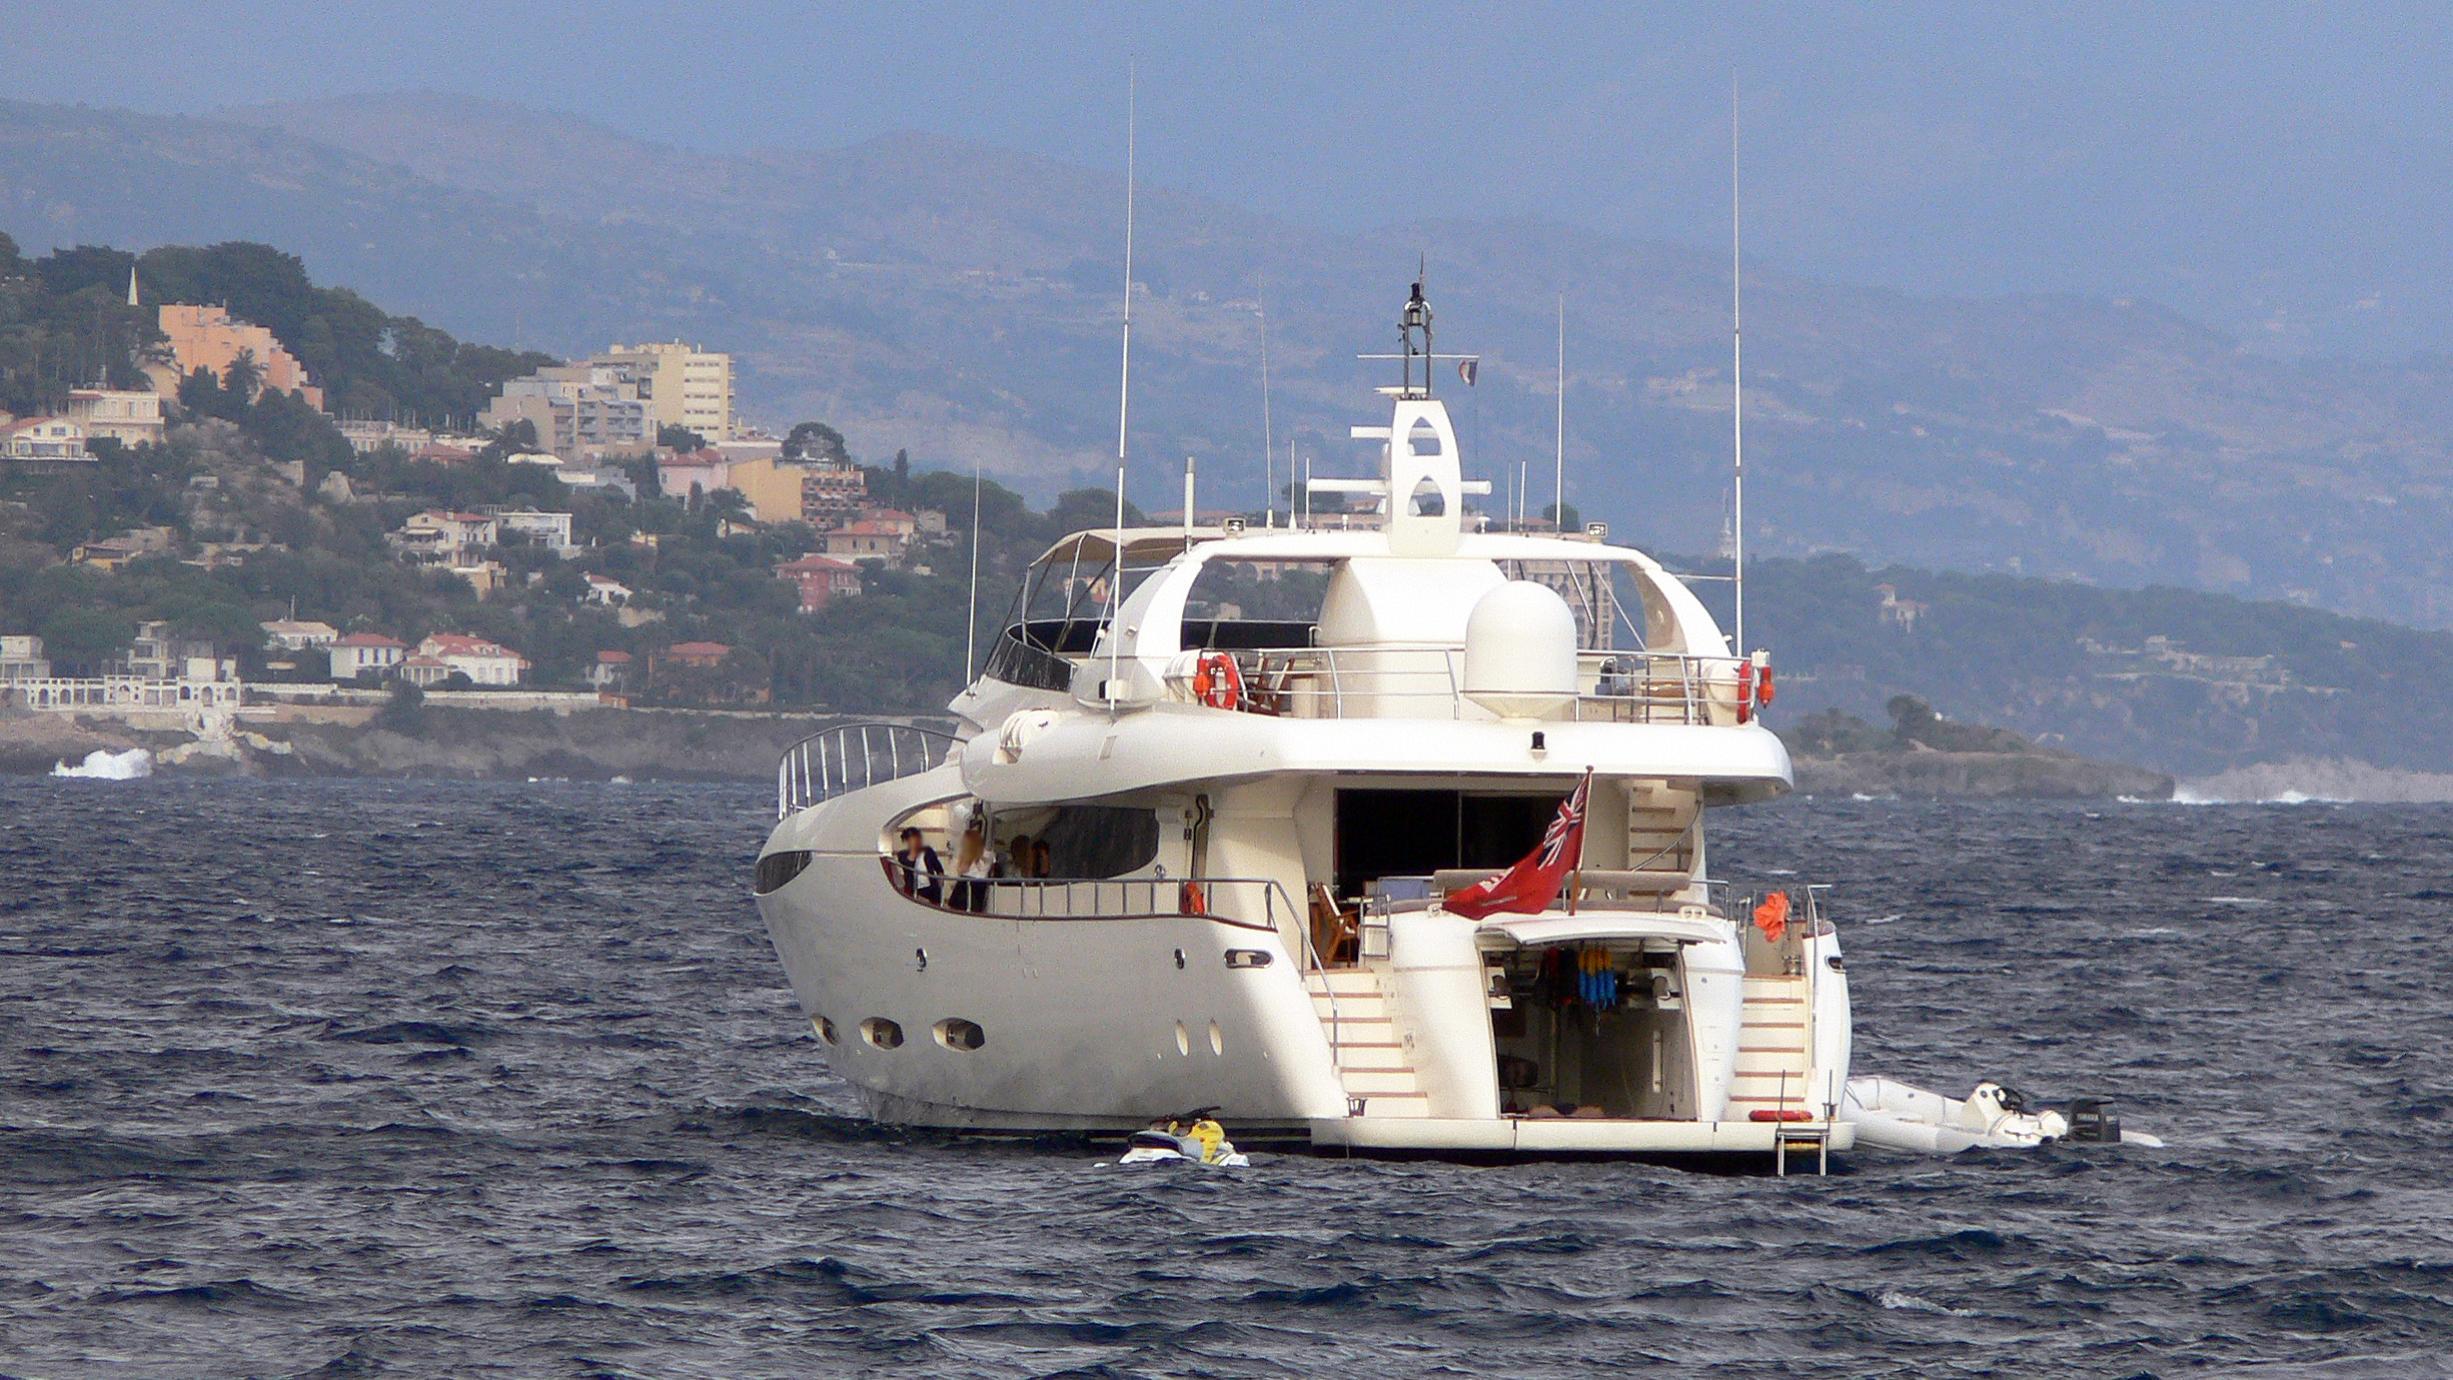 mabruk-iii-motor-yacht-leight-notika-centaurian-115-2004-36m-stern